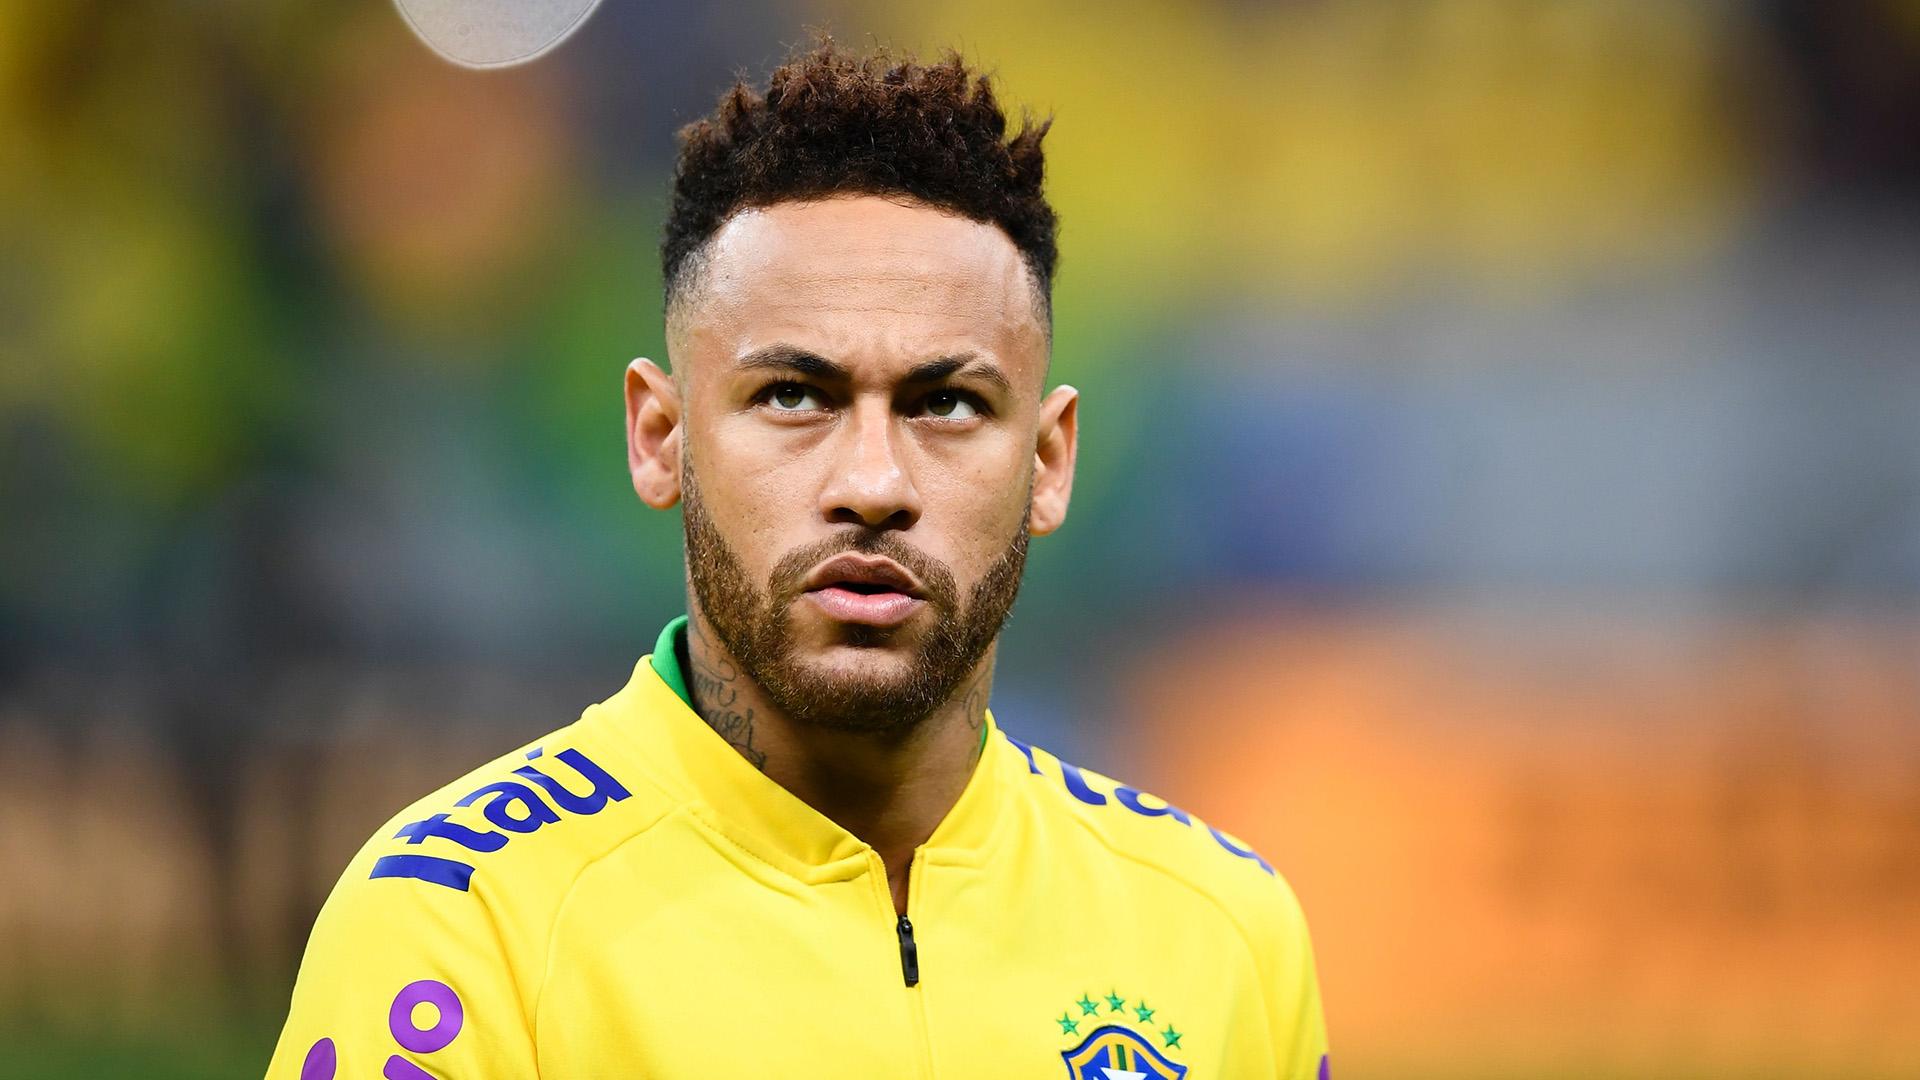 'Neymar should play where he is happiest' – Tite offers advice as Barca links swirl